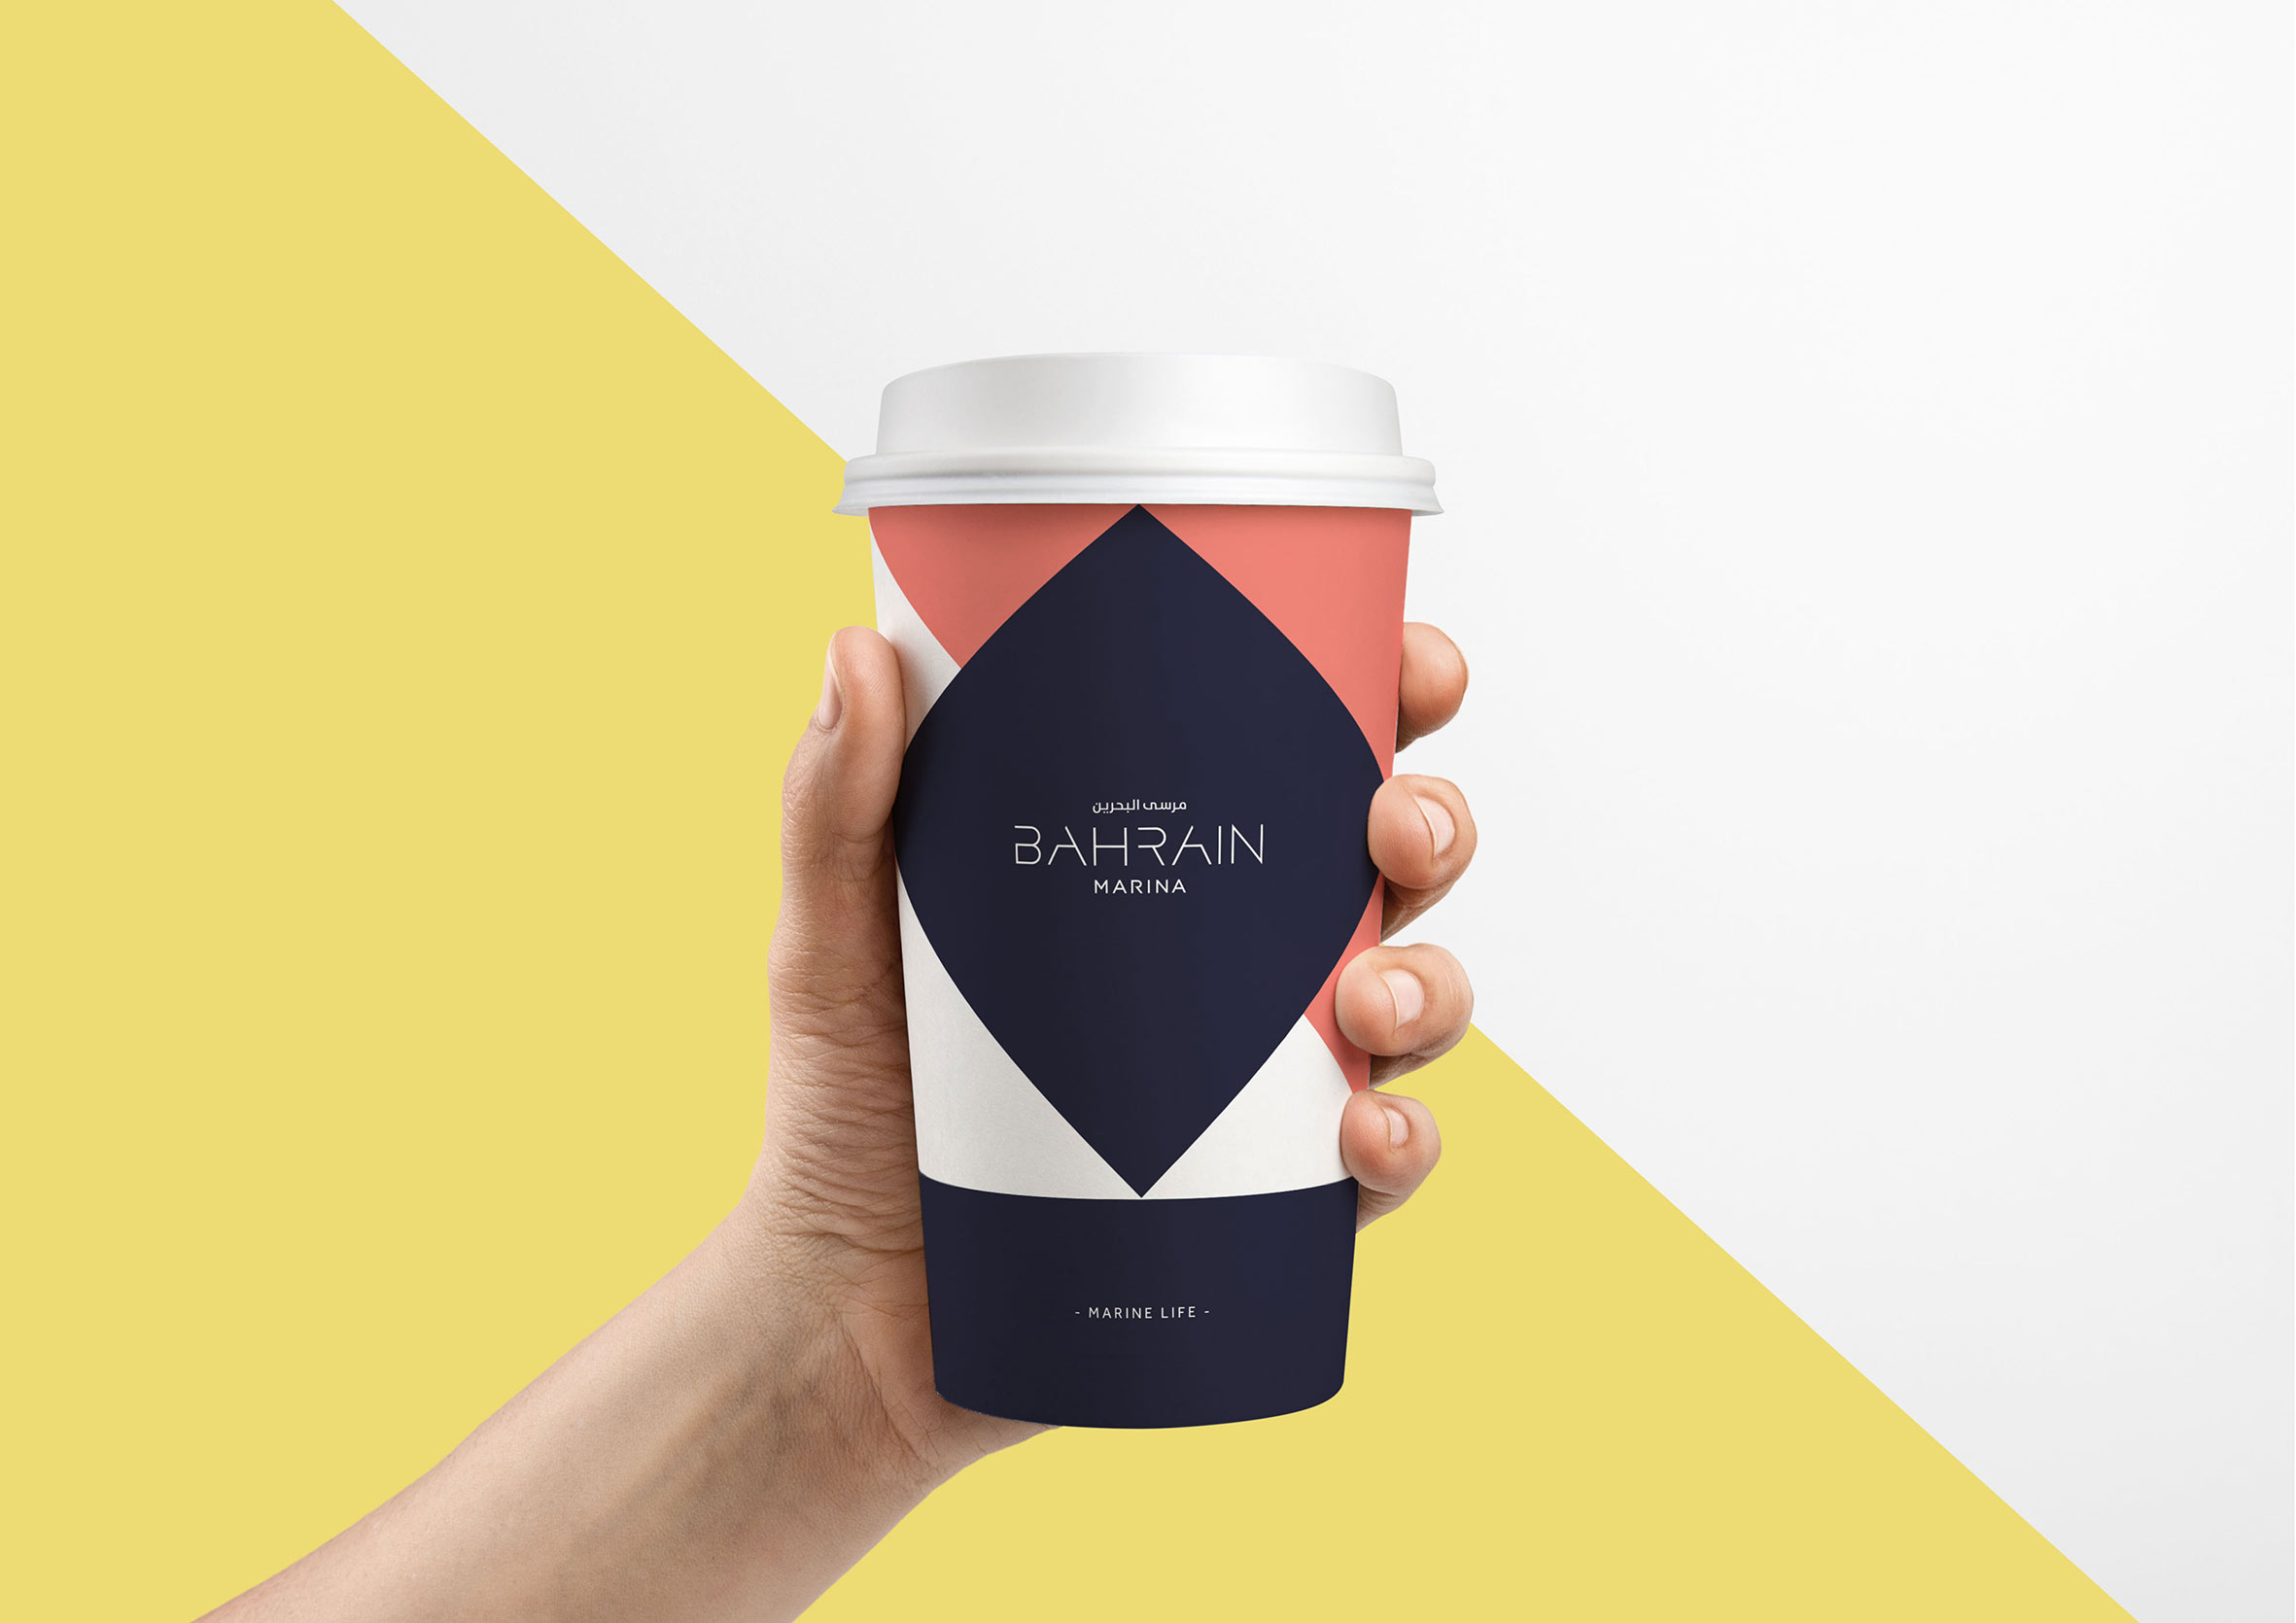 Bahrain-marina-identite-branding-paper-cup.jpg